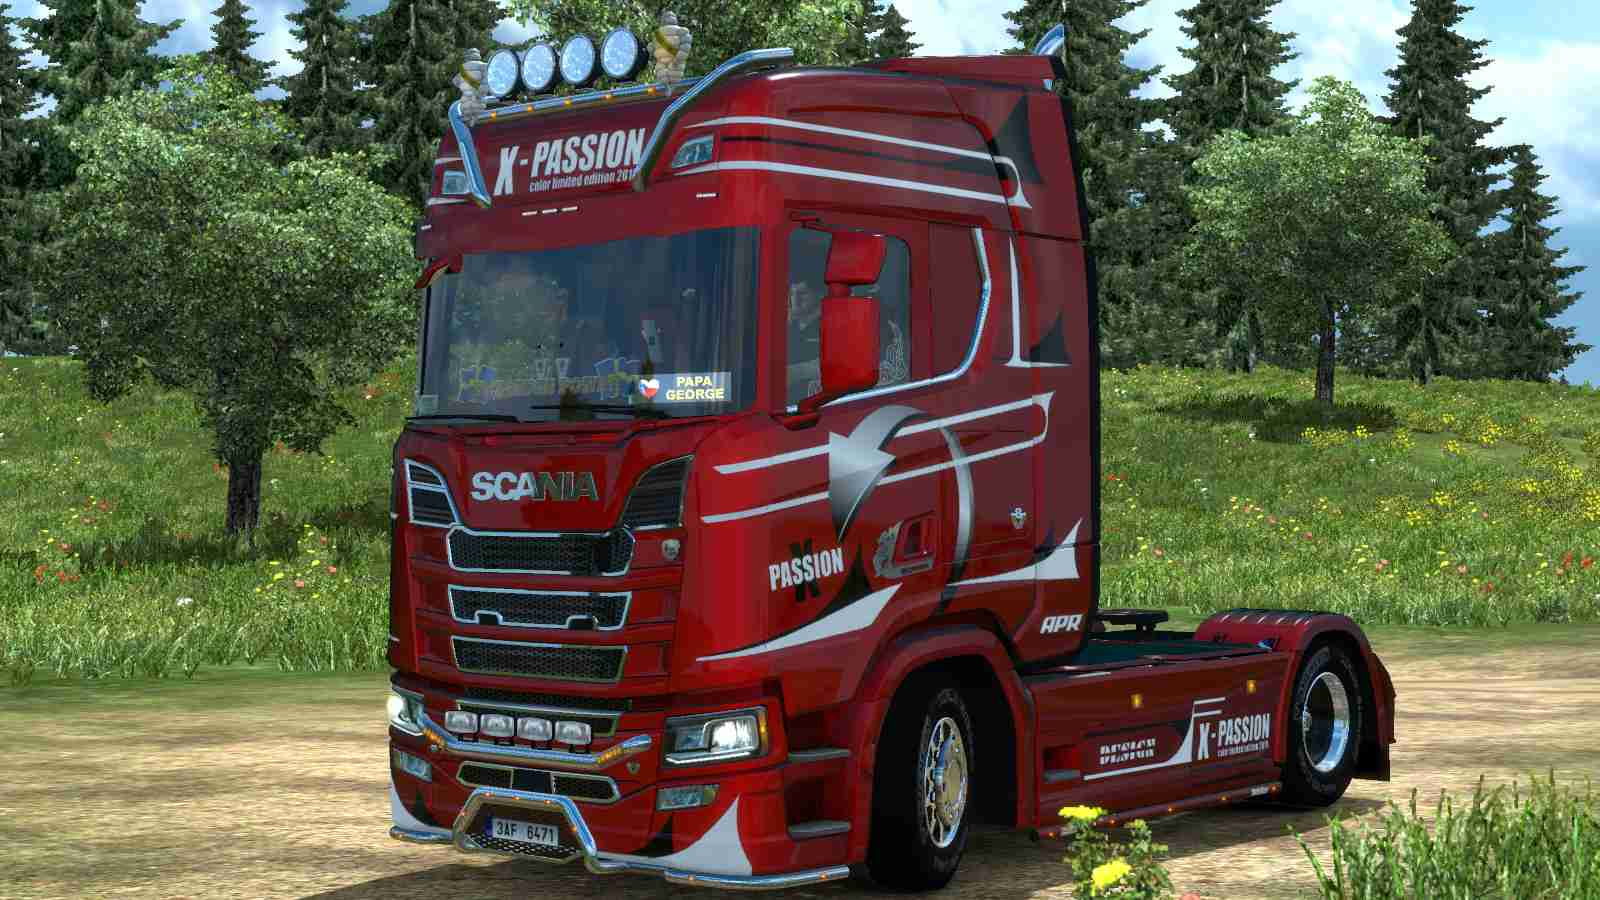 Scania S NG Passion metallic